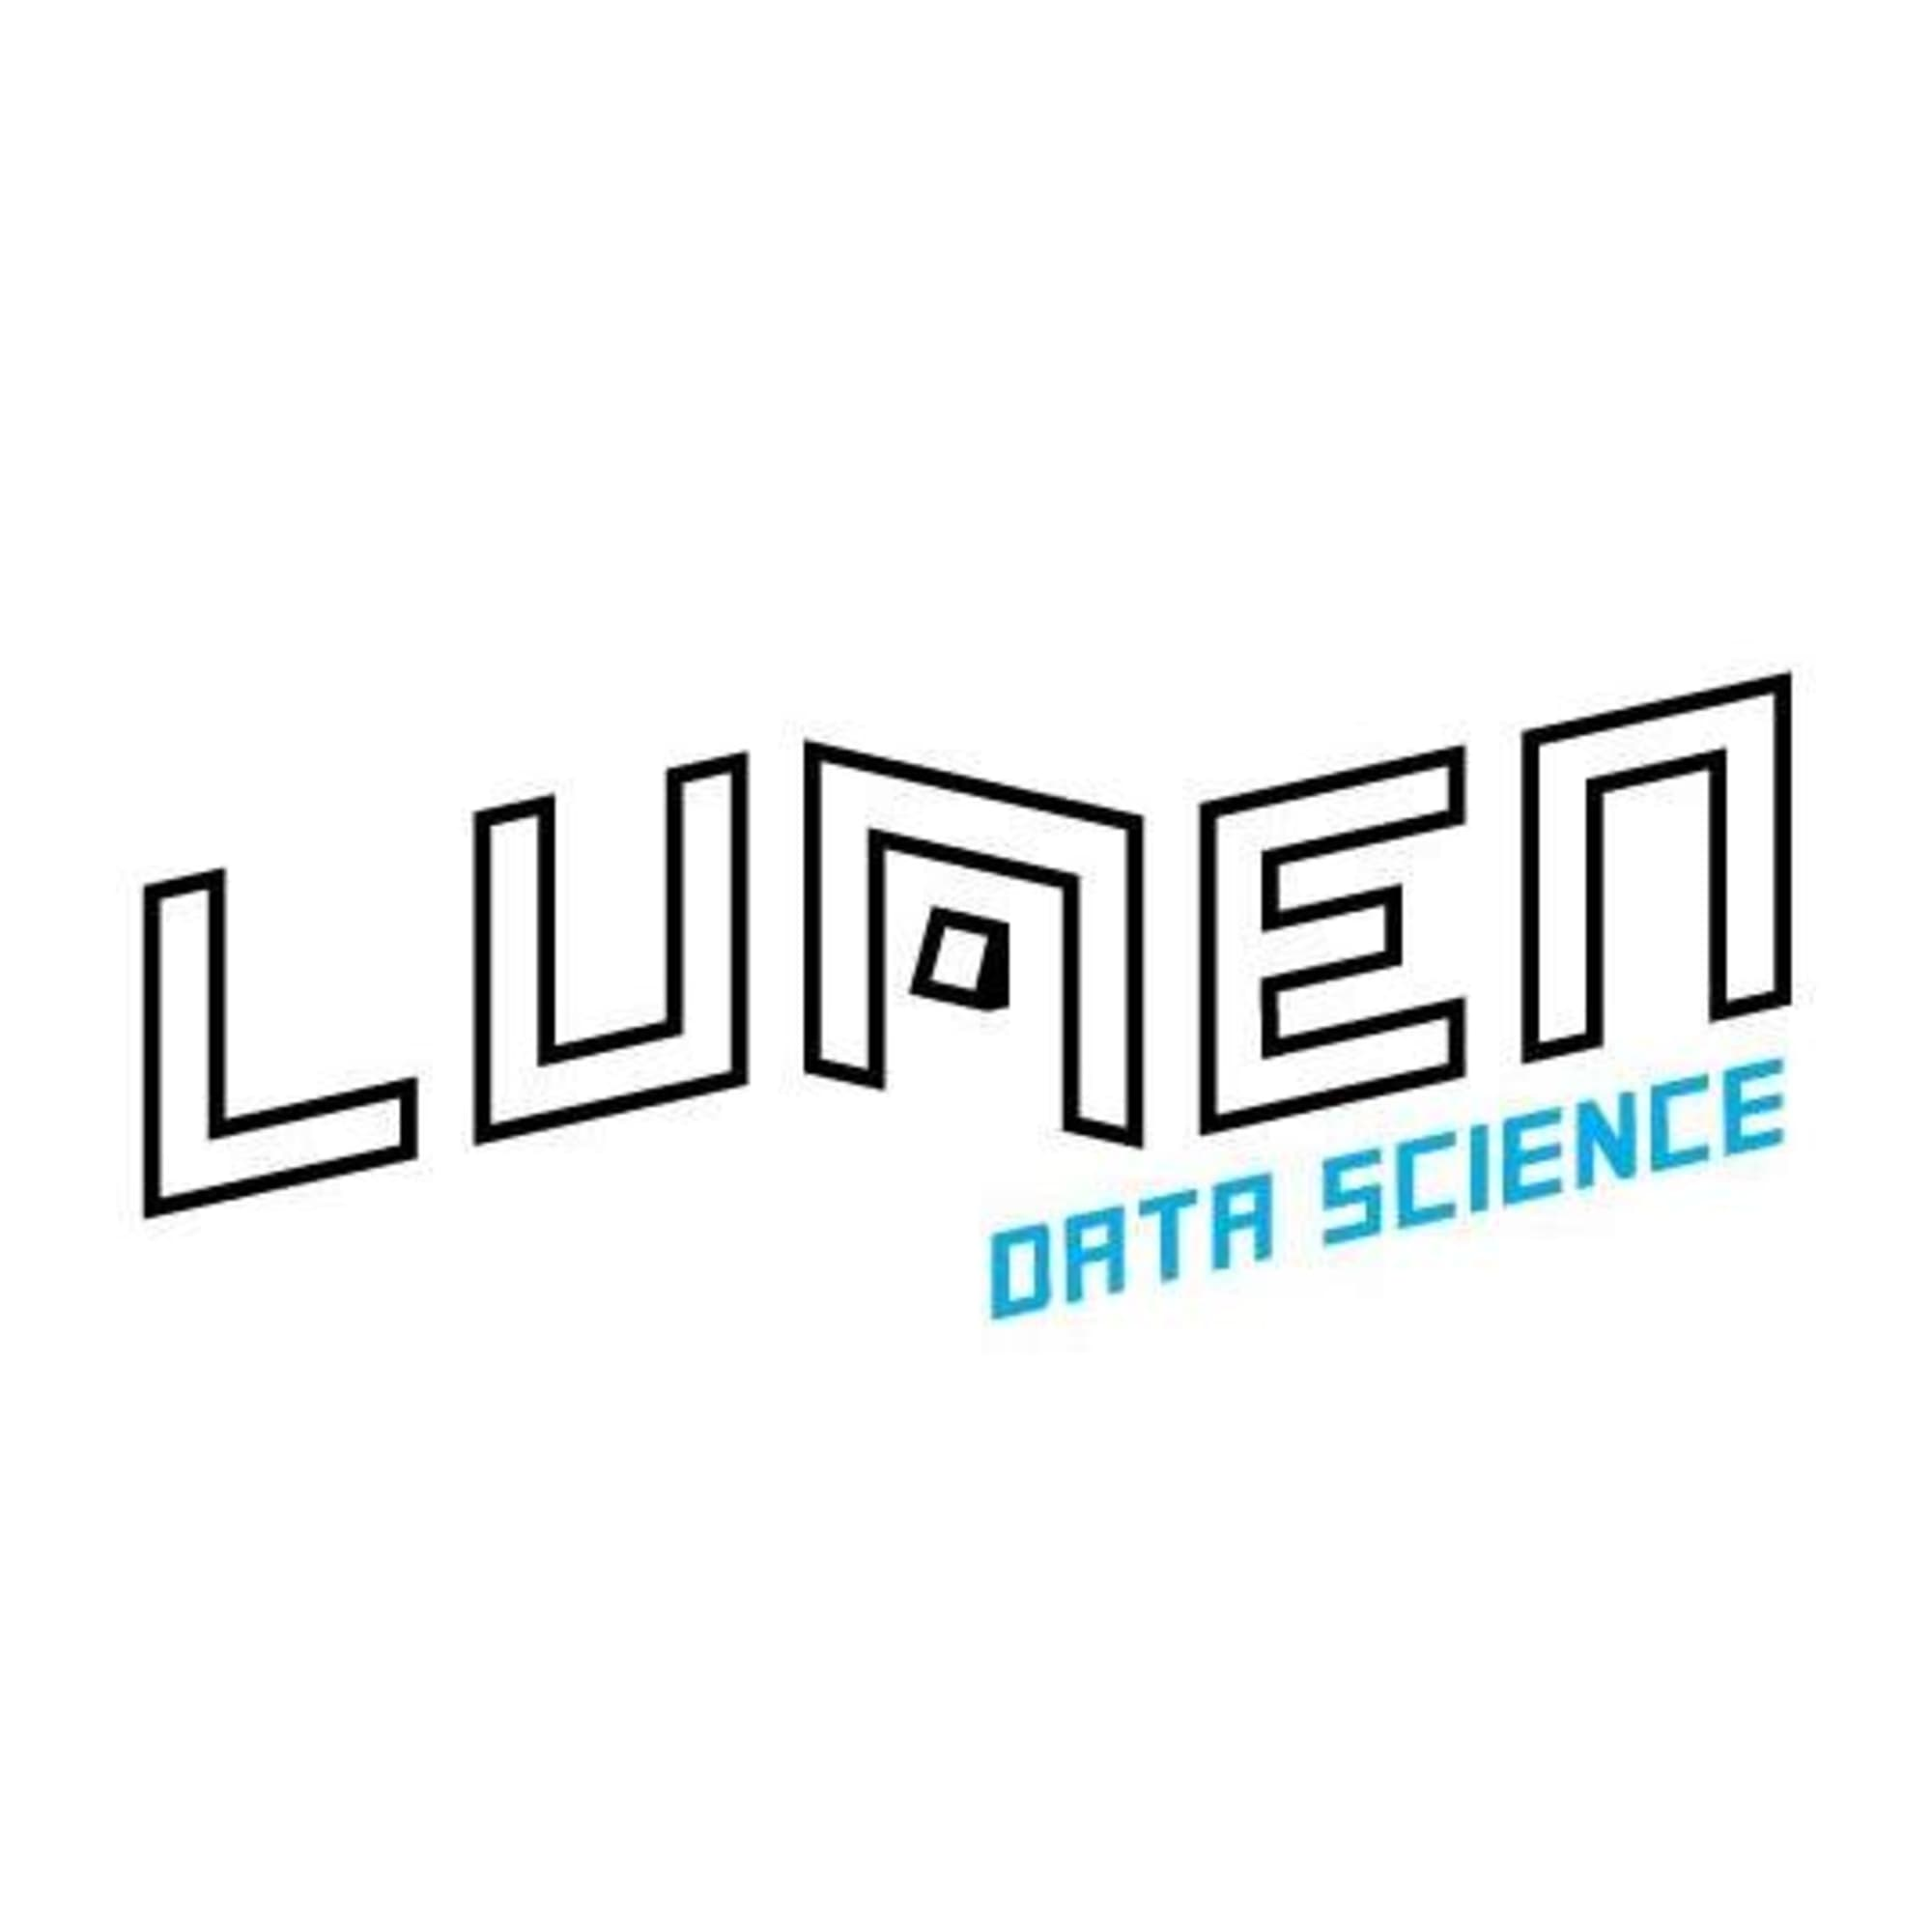 Počinju prijave za LUMEN Data science PREMIUM partnera